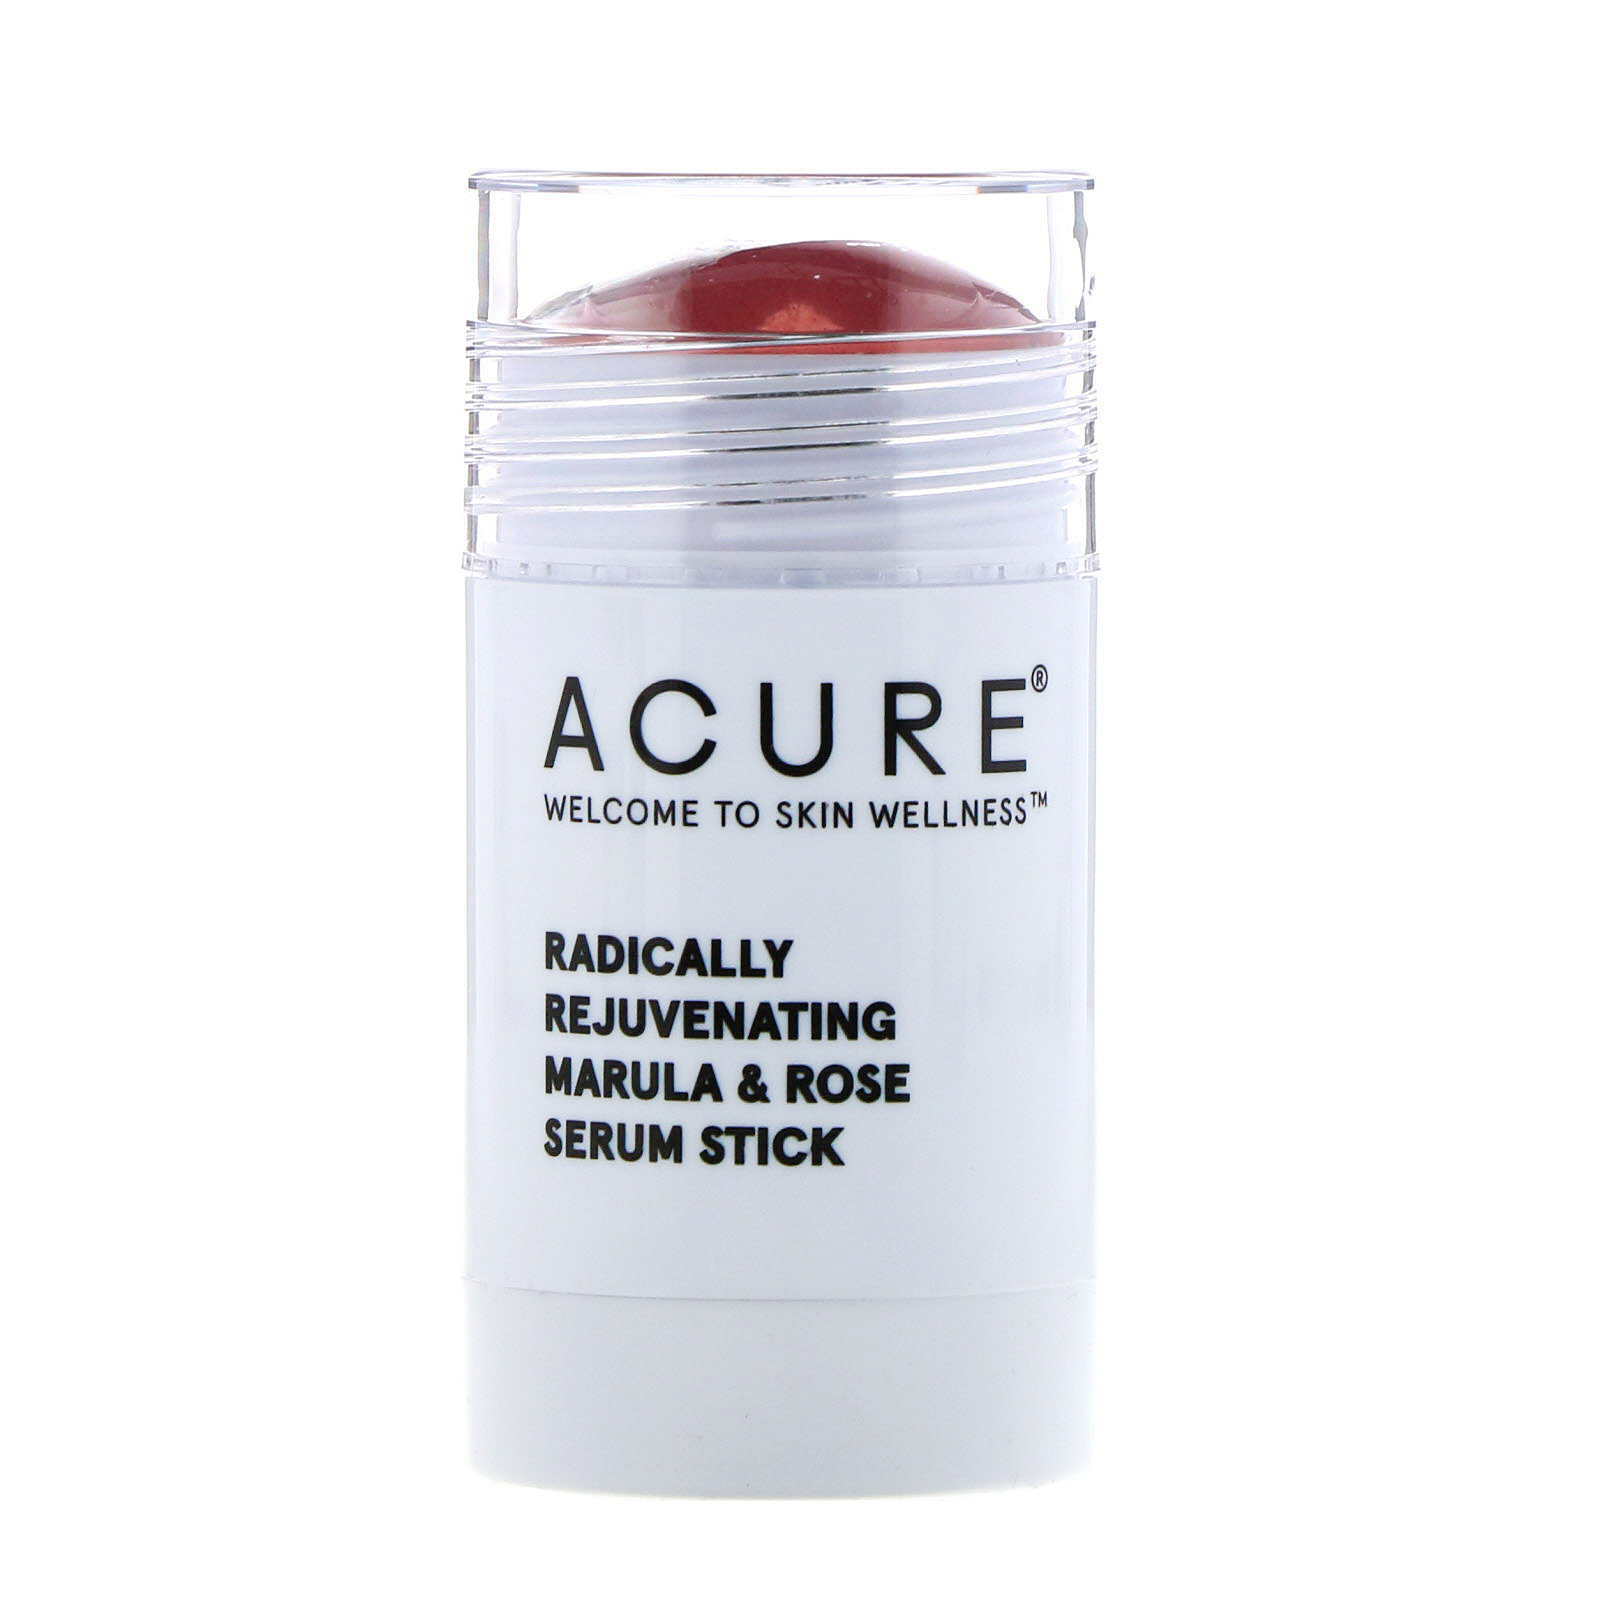 Acure Radically Rejuvenating Serum Stick 1 Oz 28 34 G